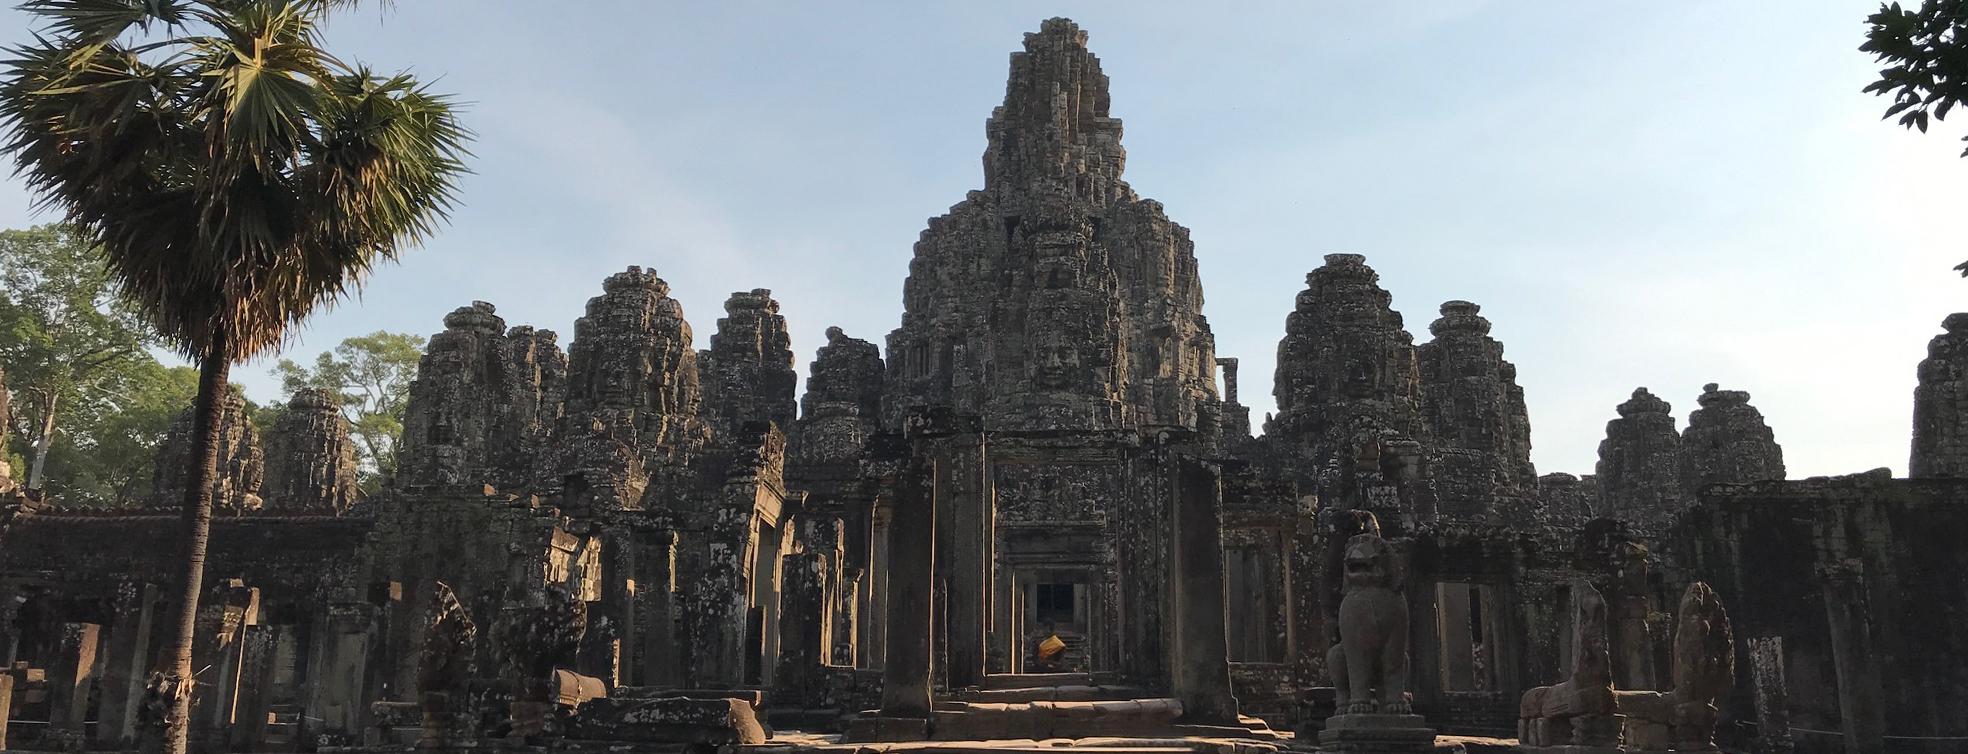 cambodia, fixer, cambodia fixer